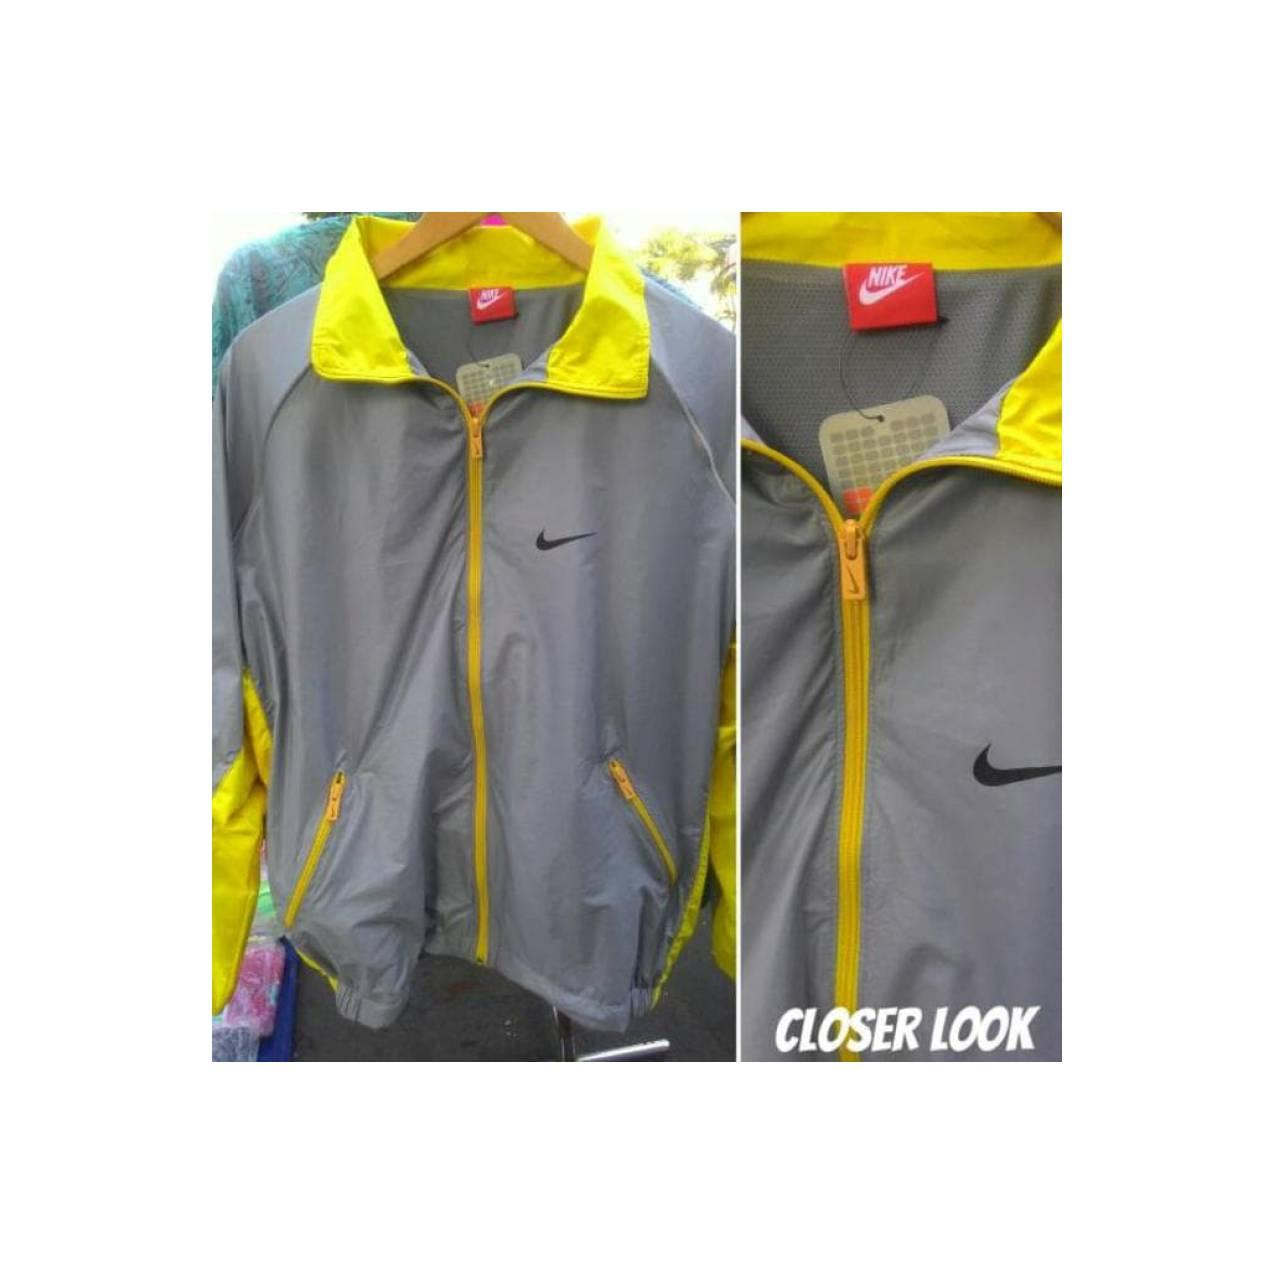 Jual Jaket Running Nike Waterproof Abu Kuning Hot